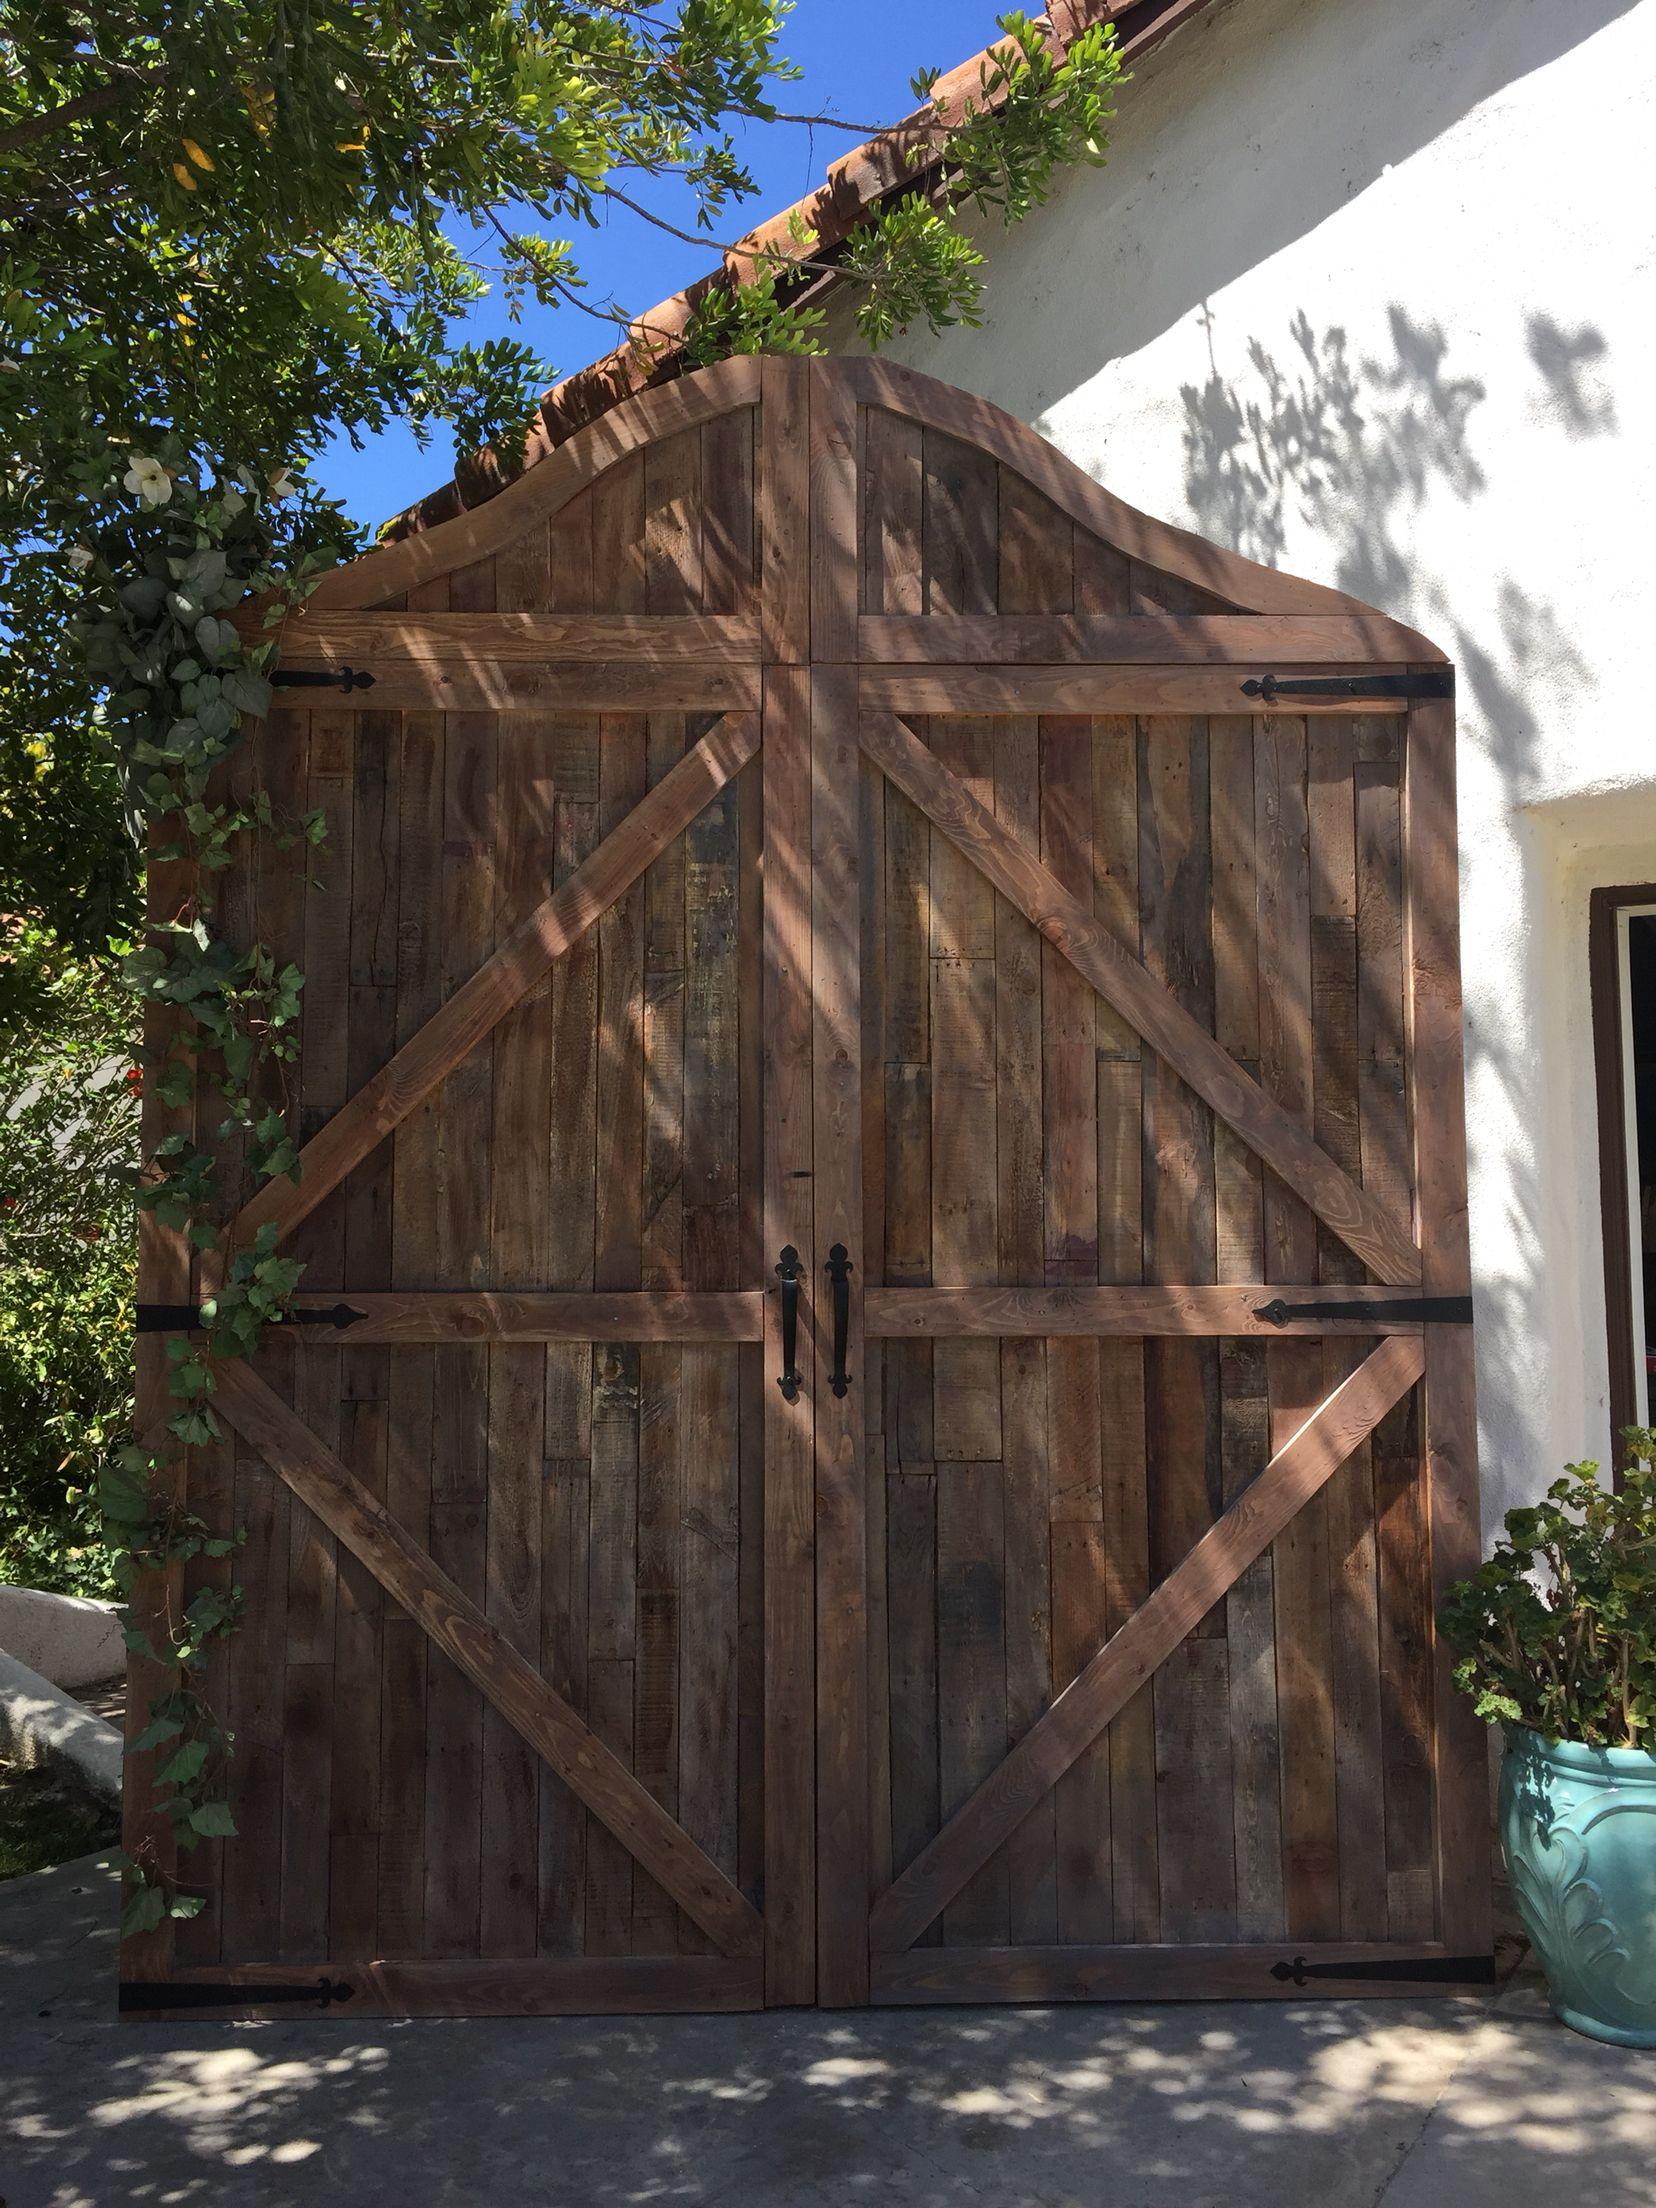 Diy Wedding Barn Door Backdrop Made From Pallets Door Backdrops